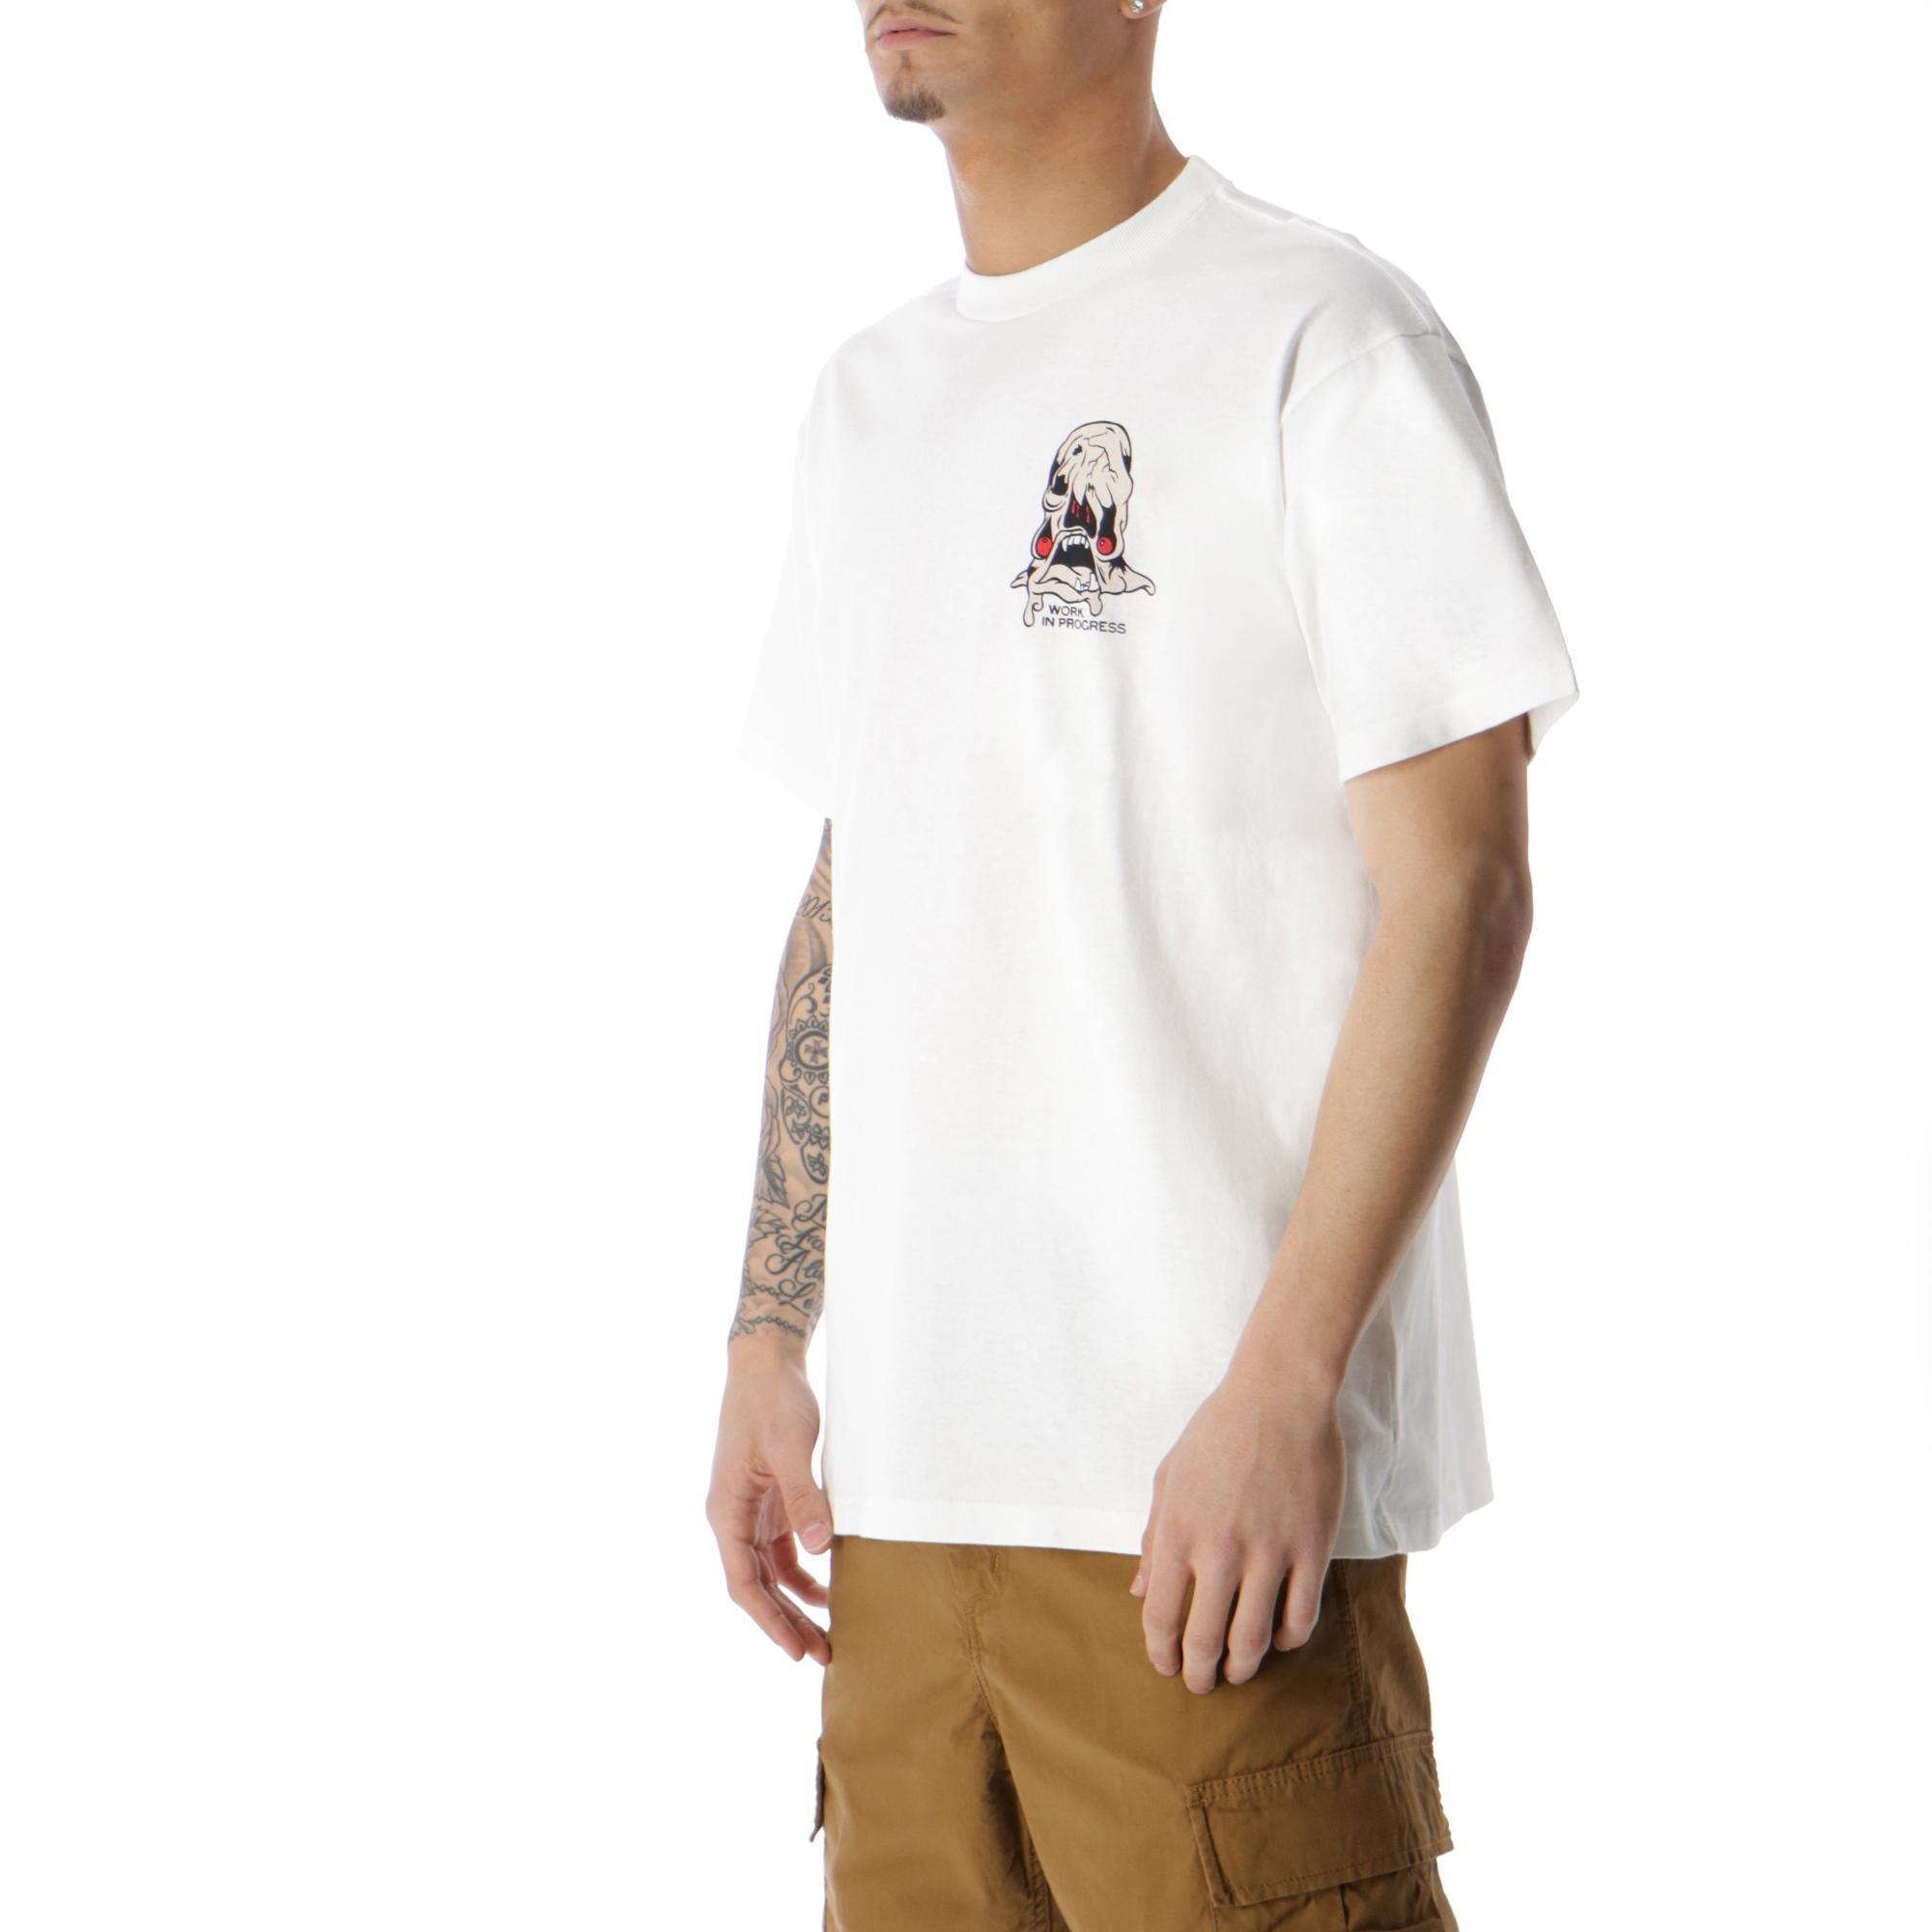 Carhartt Wip Horror T-shirt WHITE